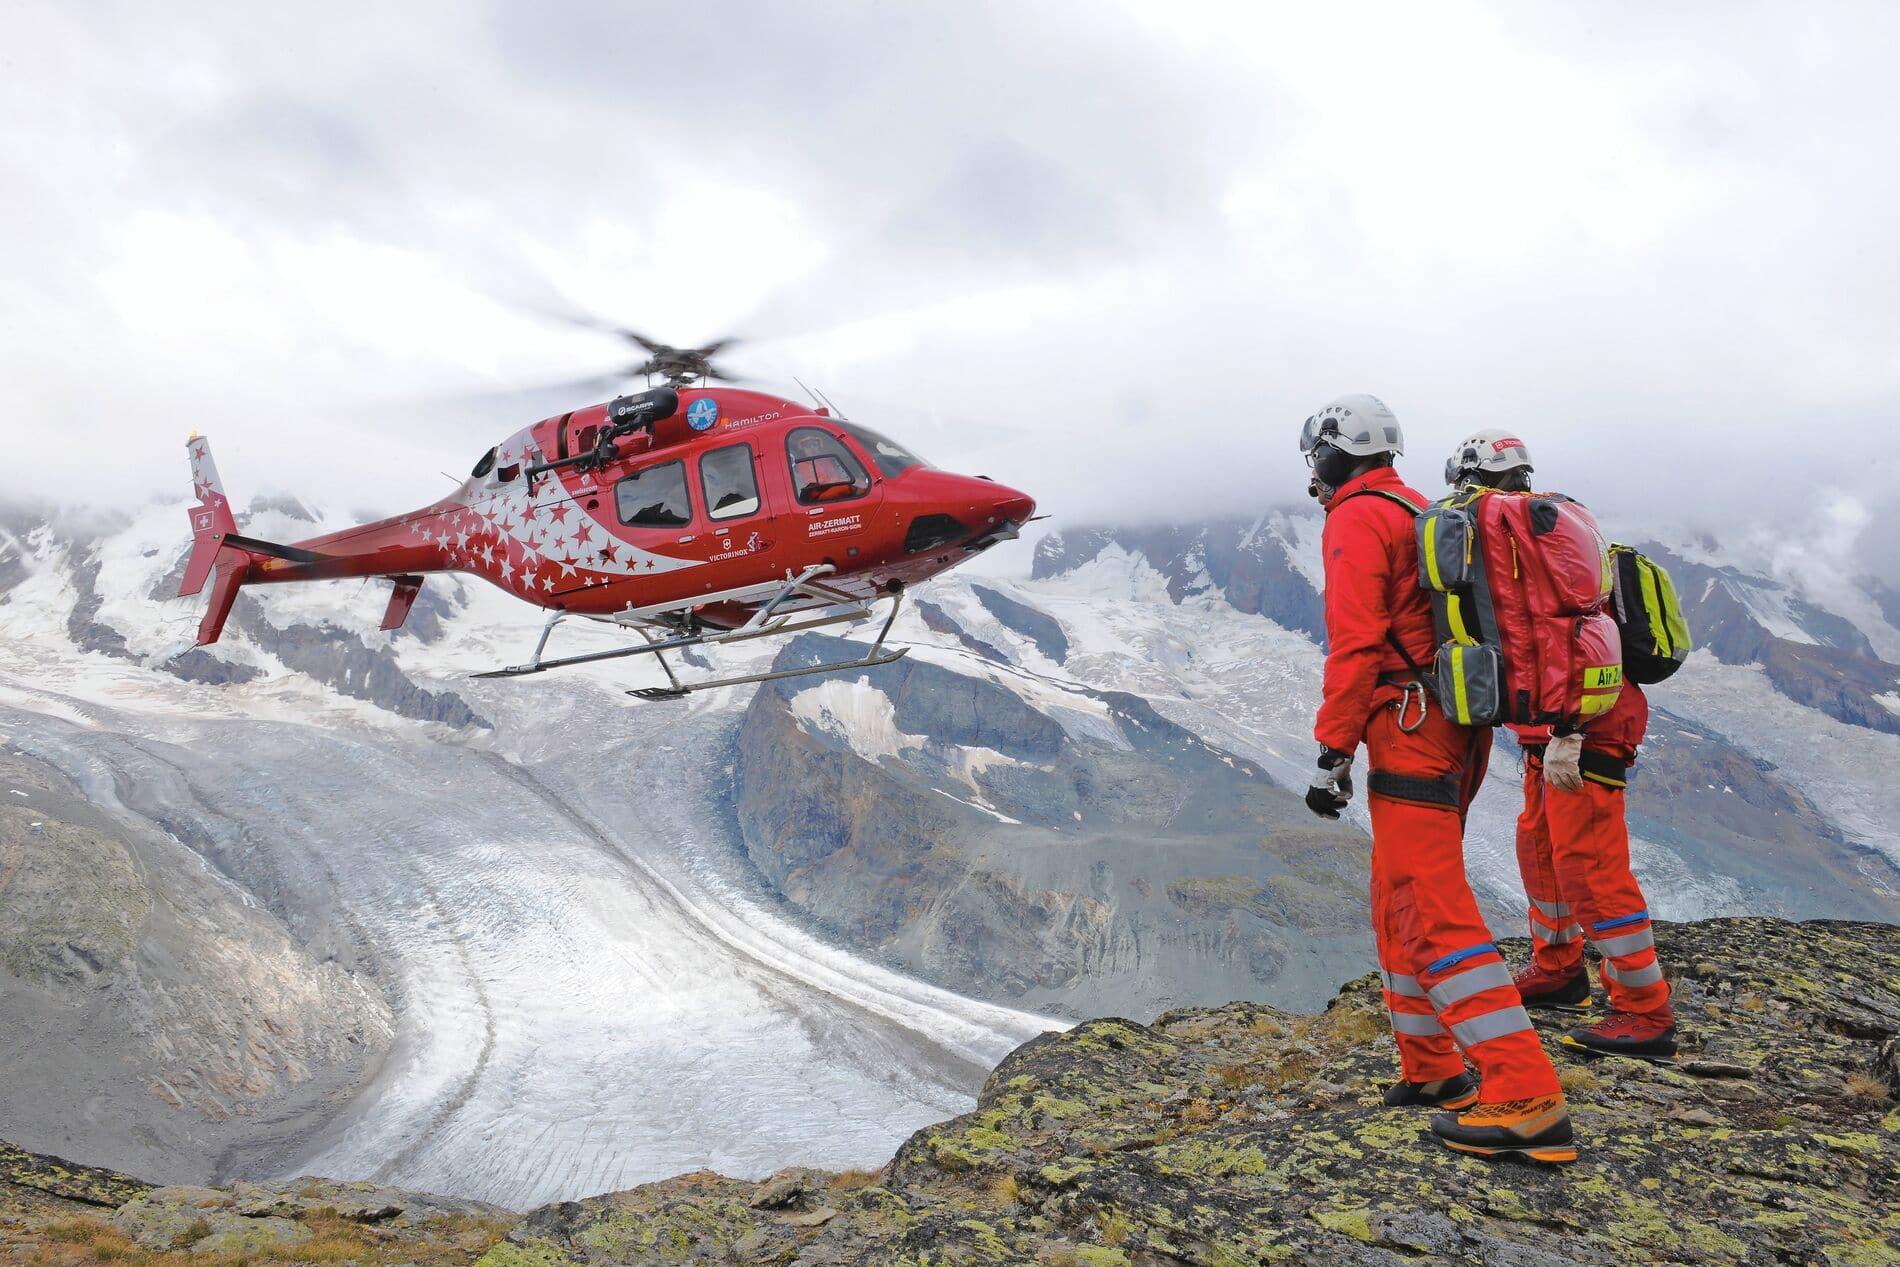 Web_Hero-00-DEC_HERO_429_Air-Zermatt_Bell-Film 623-01_2016